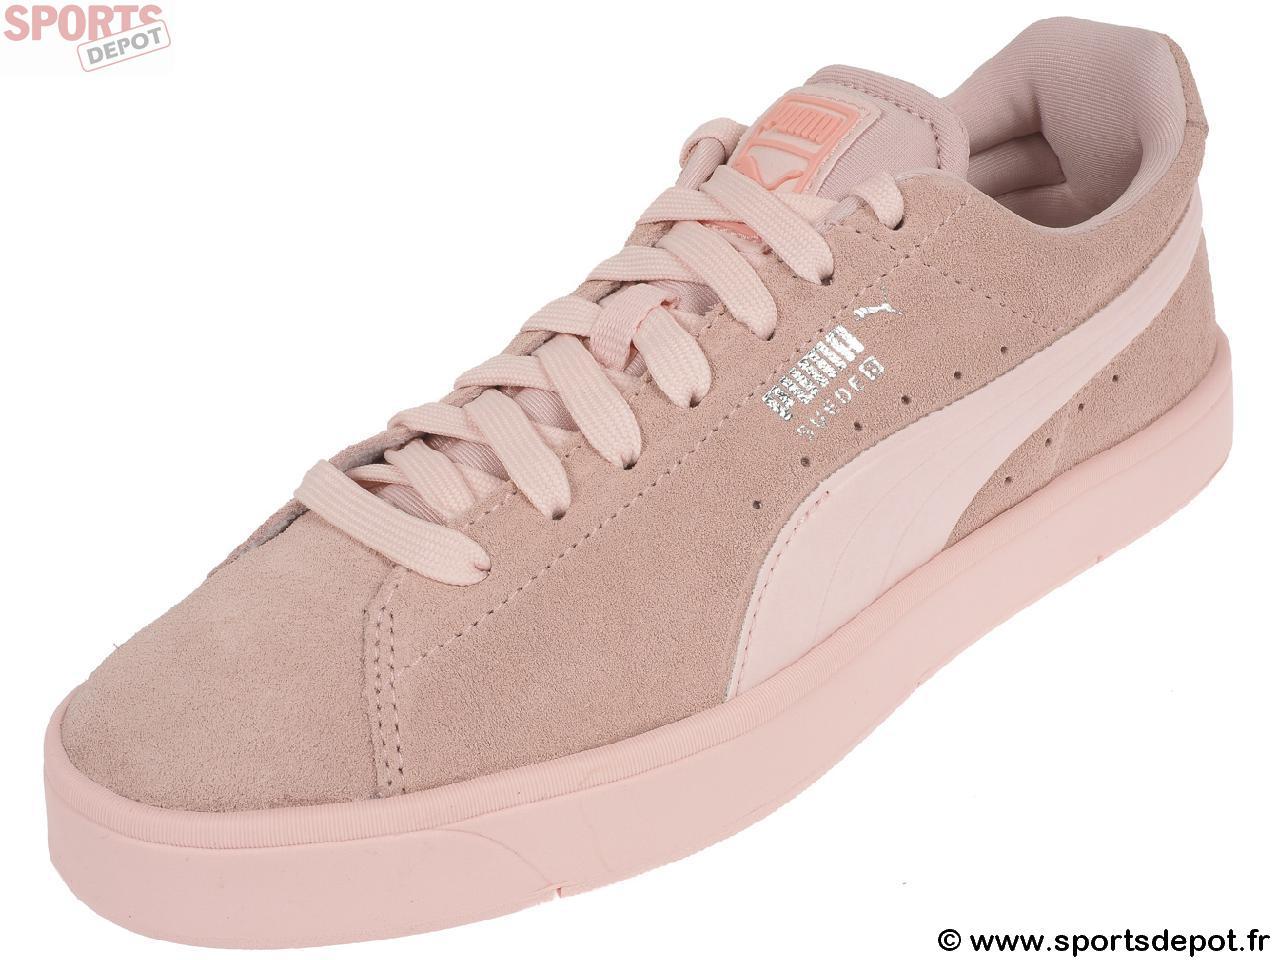 Lady Simili Suede Puma Ou Chaussures Rose S Acheter Cuir Basses TnqHIxwxfz